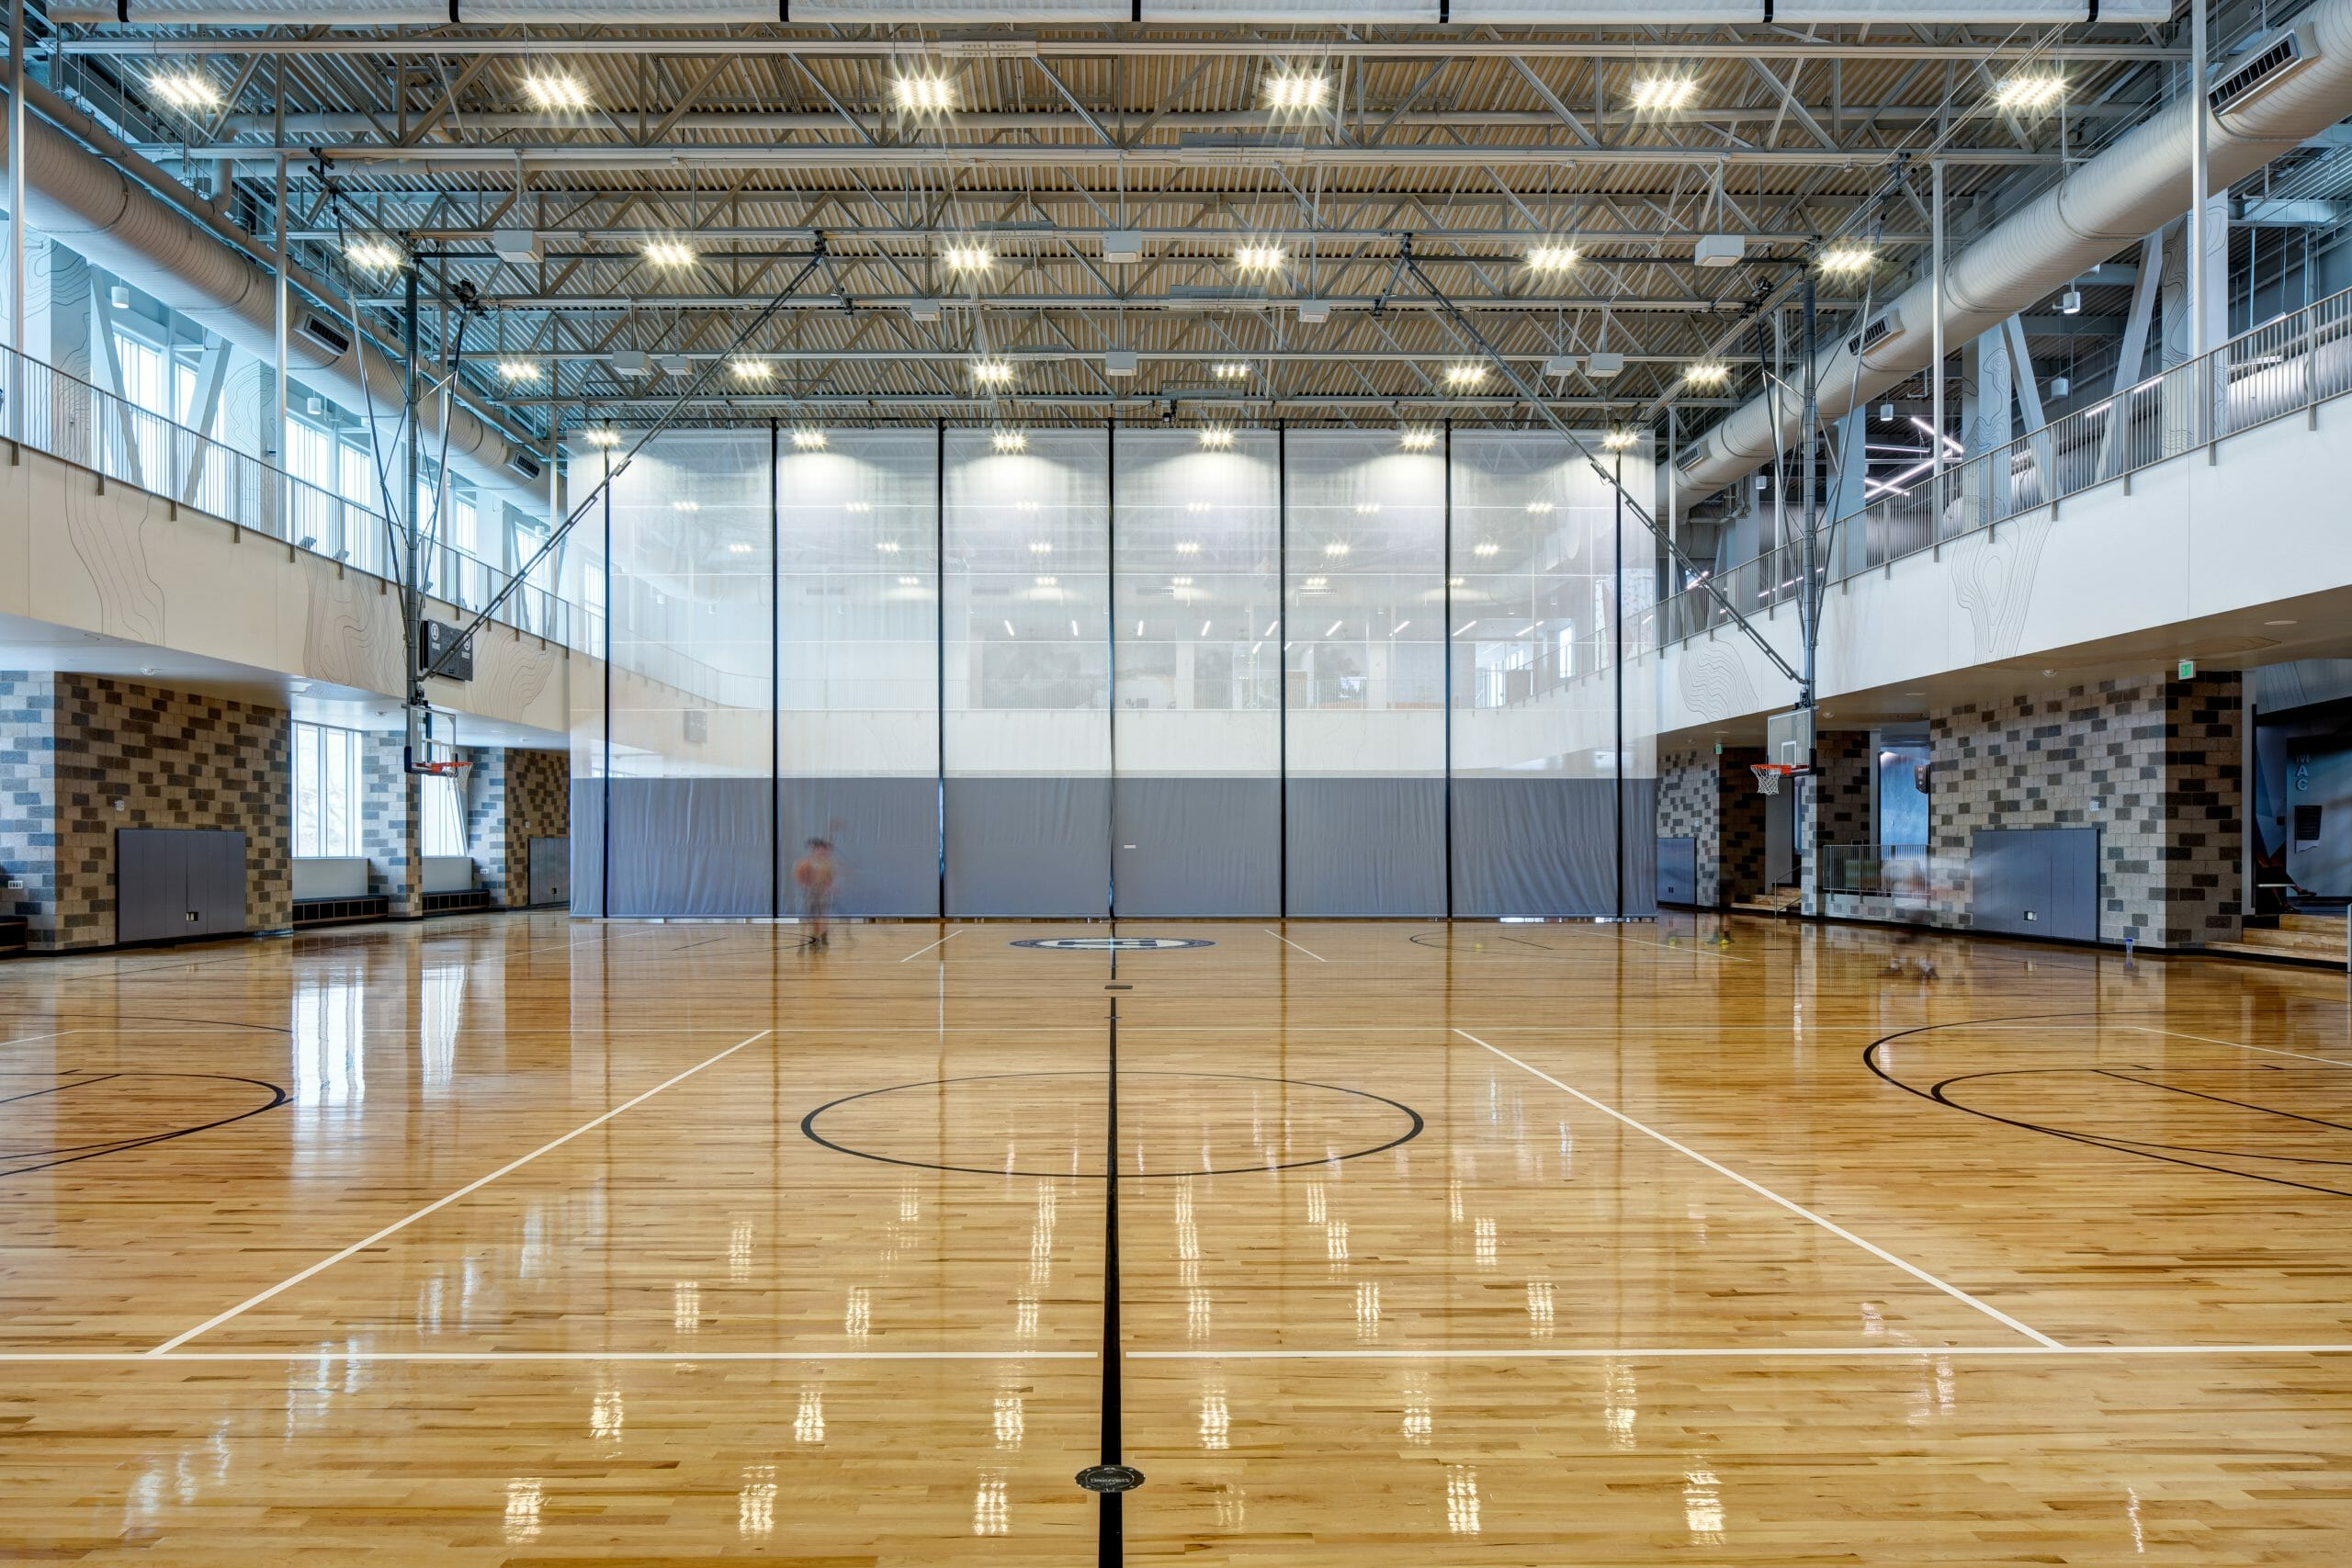 Aggie Recreation Center